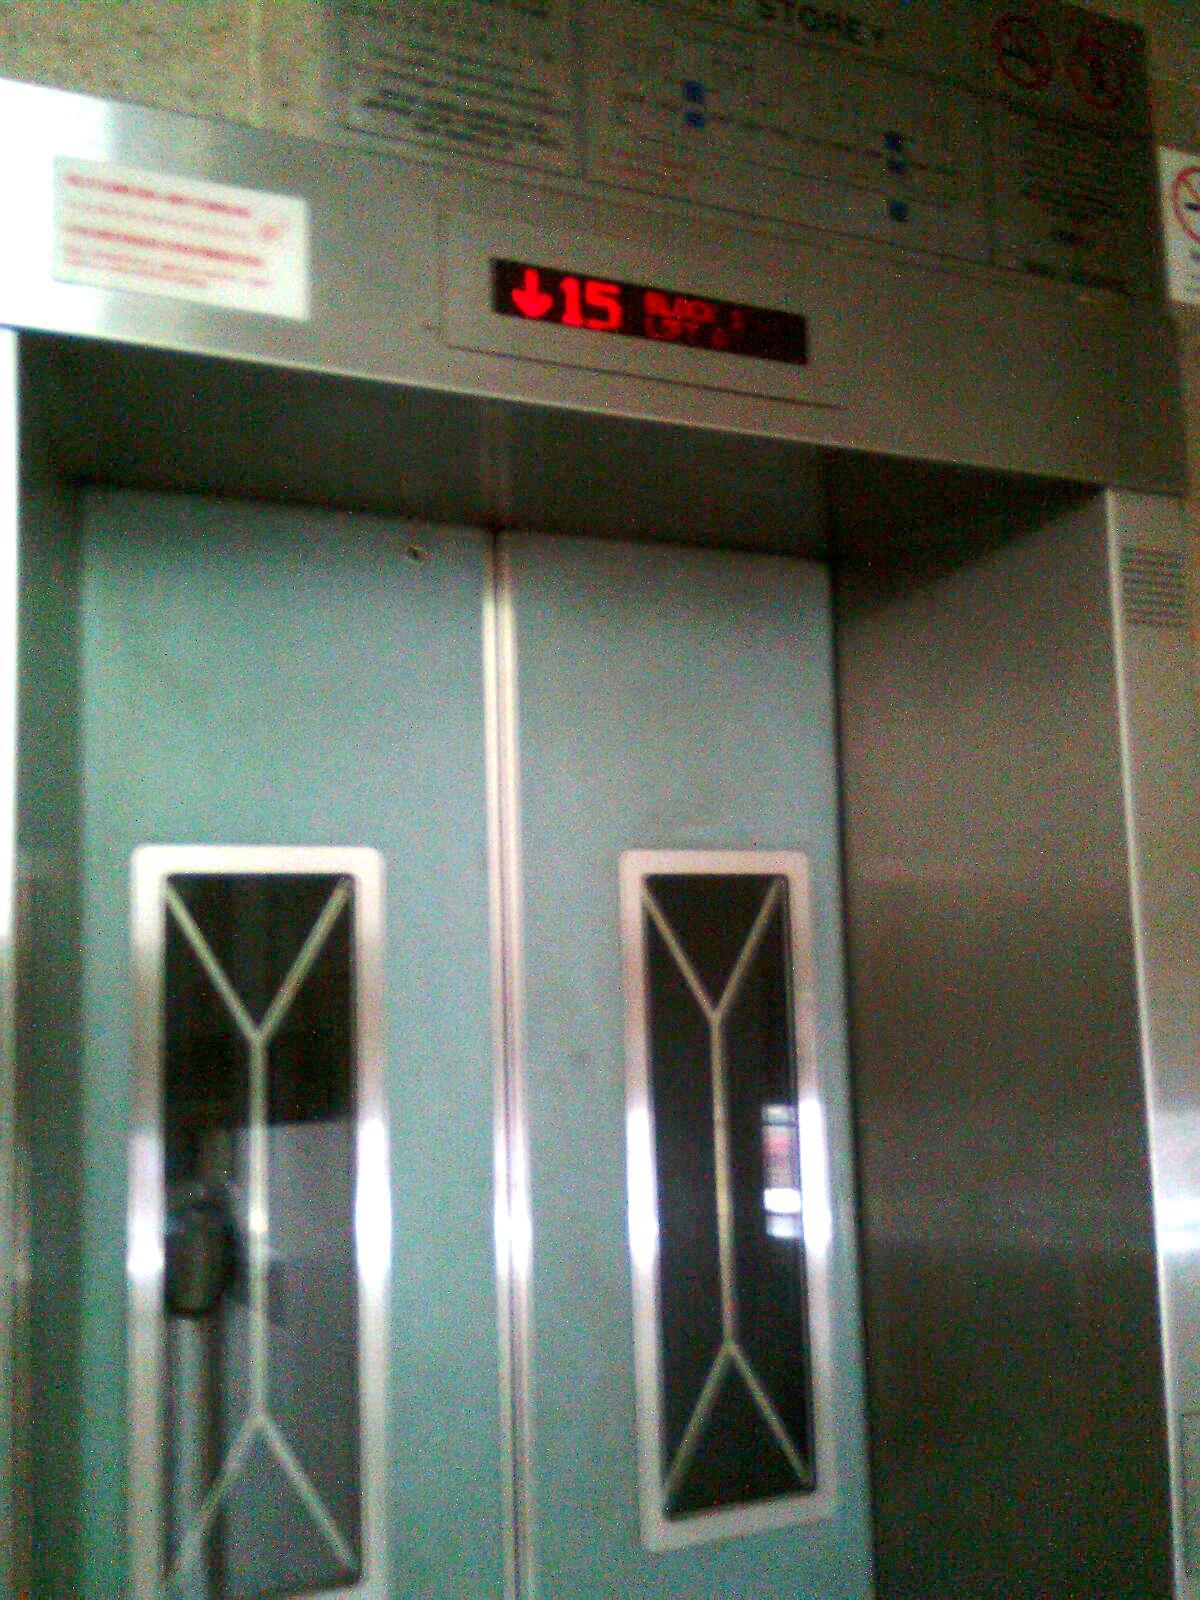 otis elevator repair manualgda26800lj2 how to and user guide rh taxibermuda co